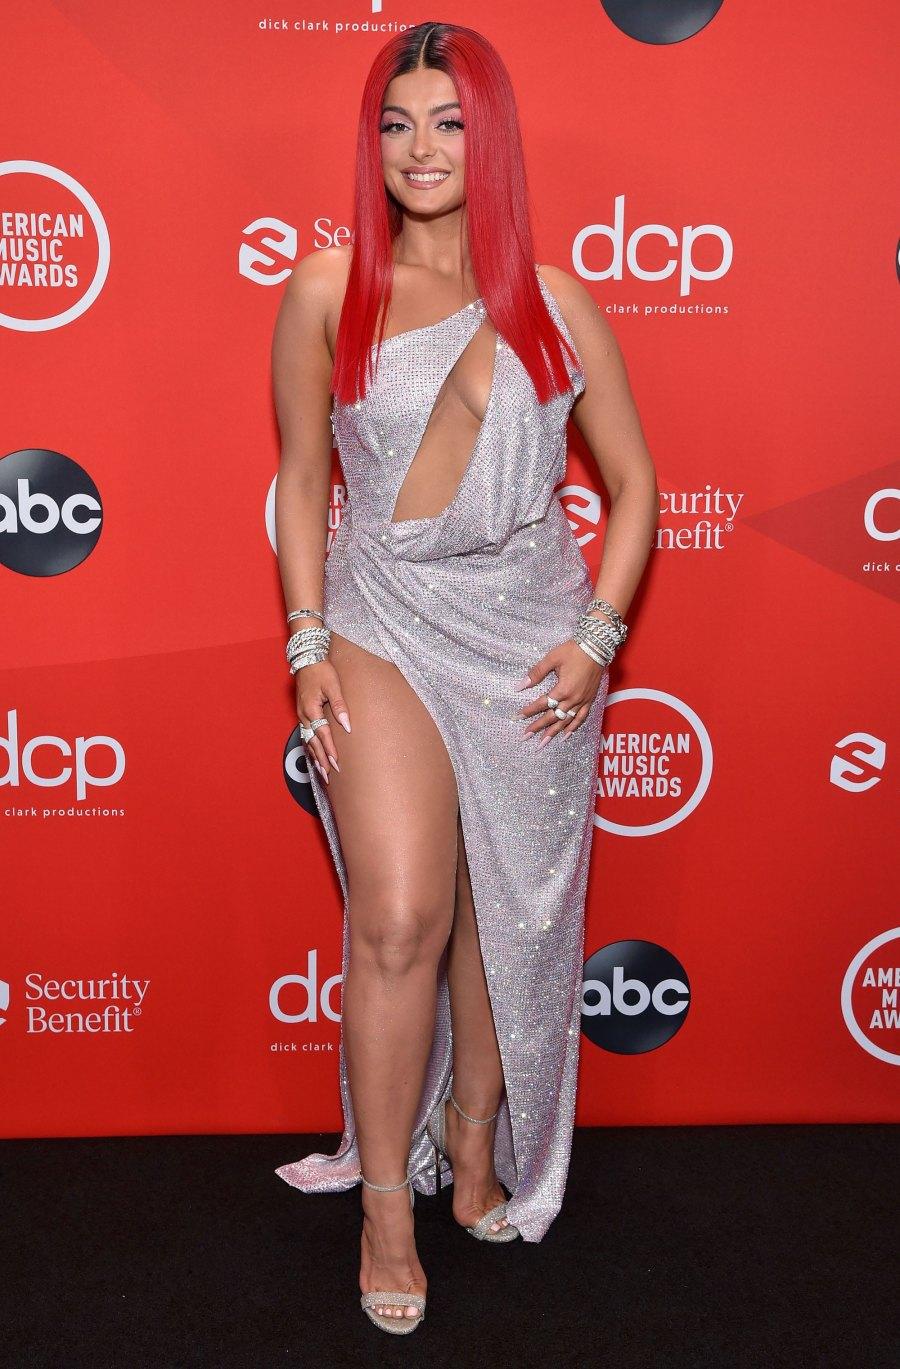 2020 American Music Awards - Bebe Rexha